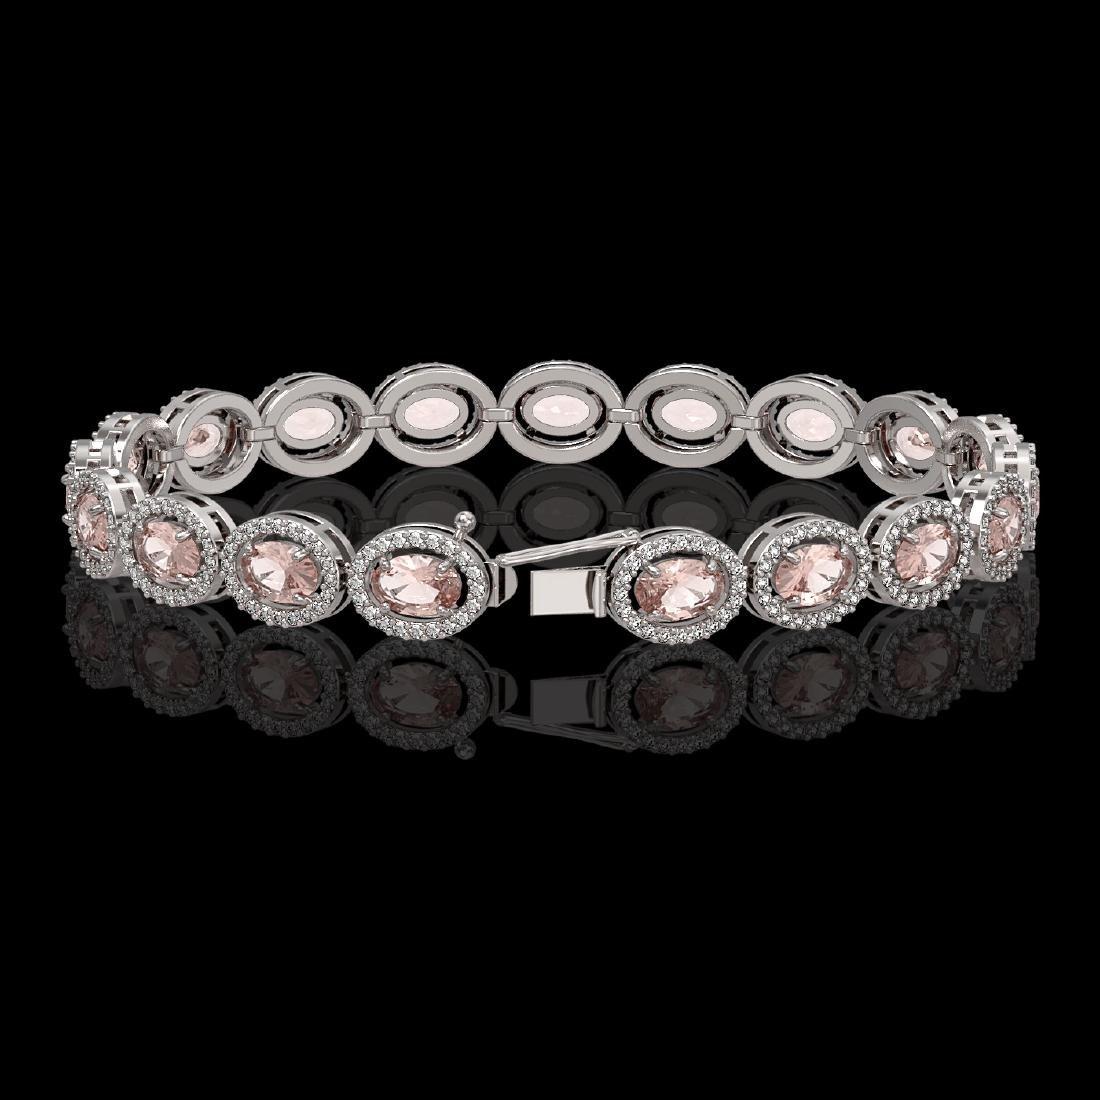 14.25 CTW Morganite & Diamond Halo Bracelet 10K White - 2